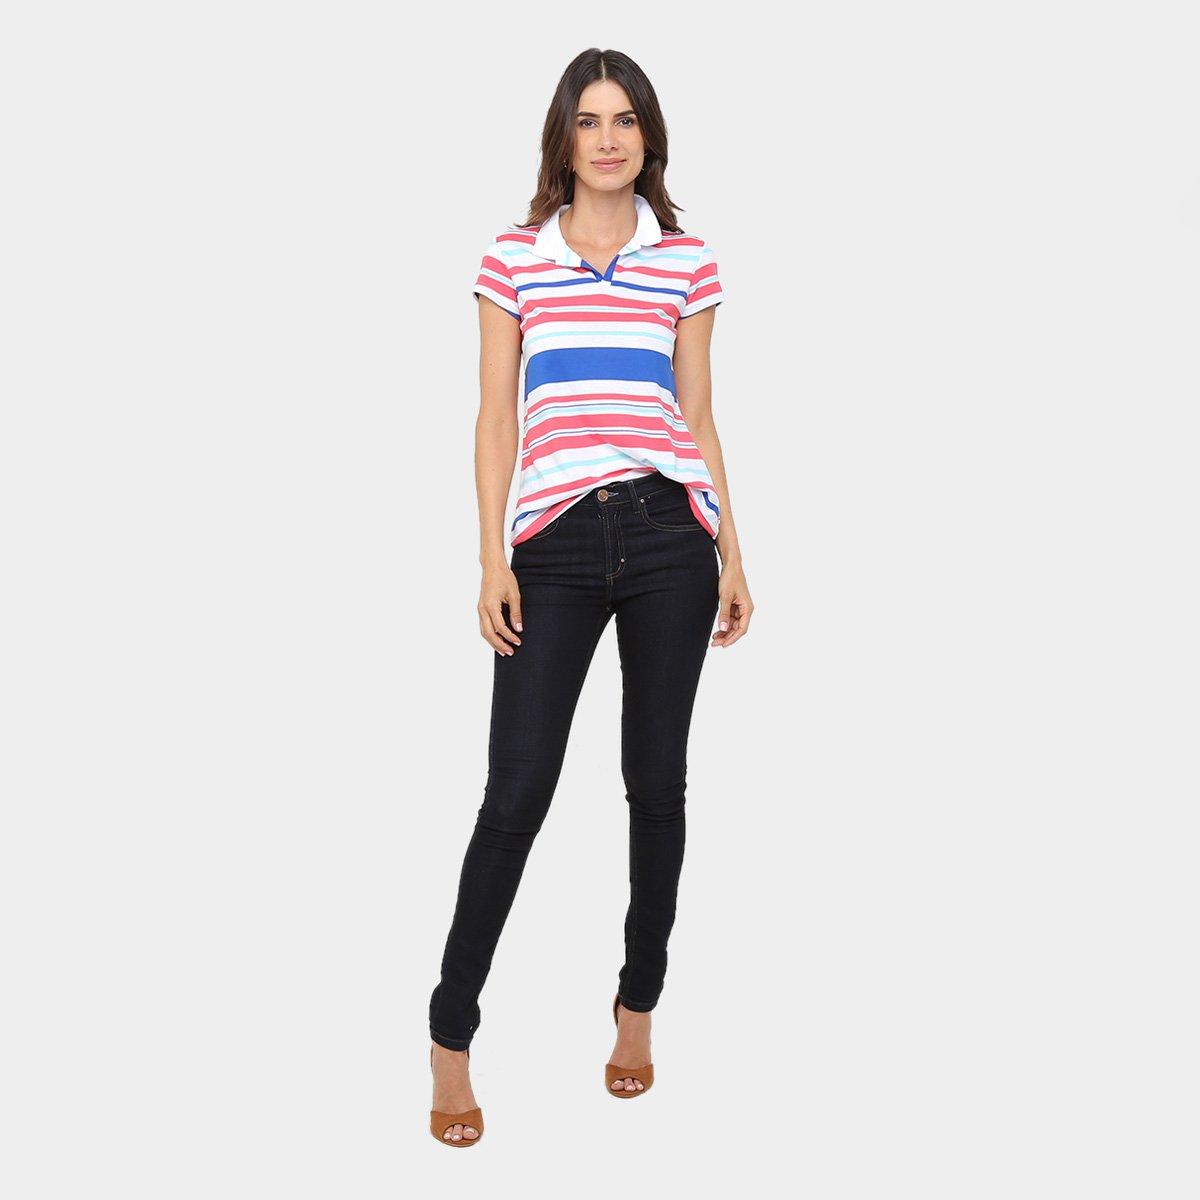 Camisa Polo Malwee Listrada Feminina - Compre Agora   Zattini f87b650860